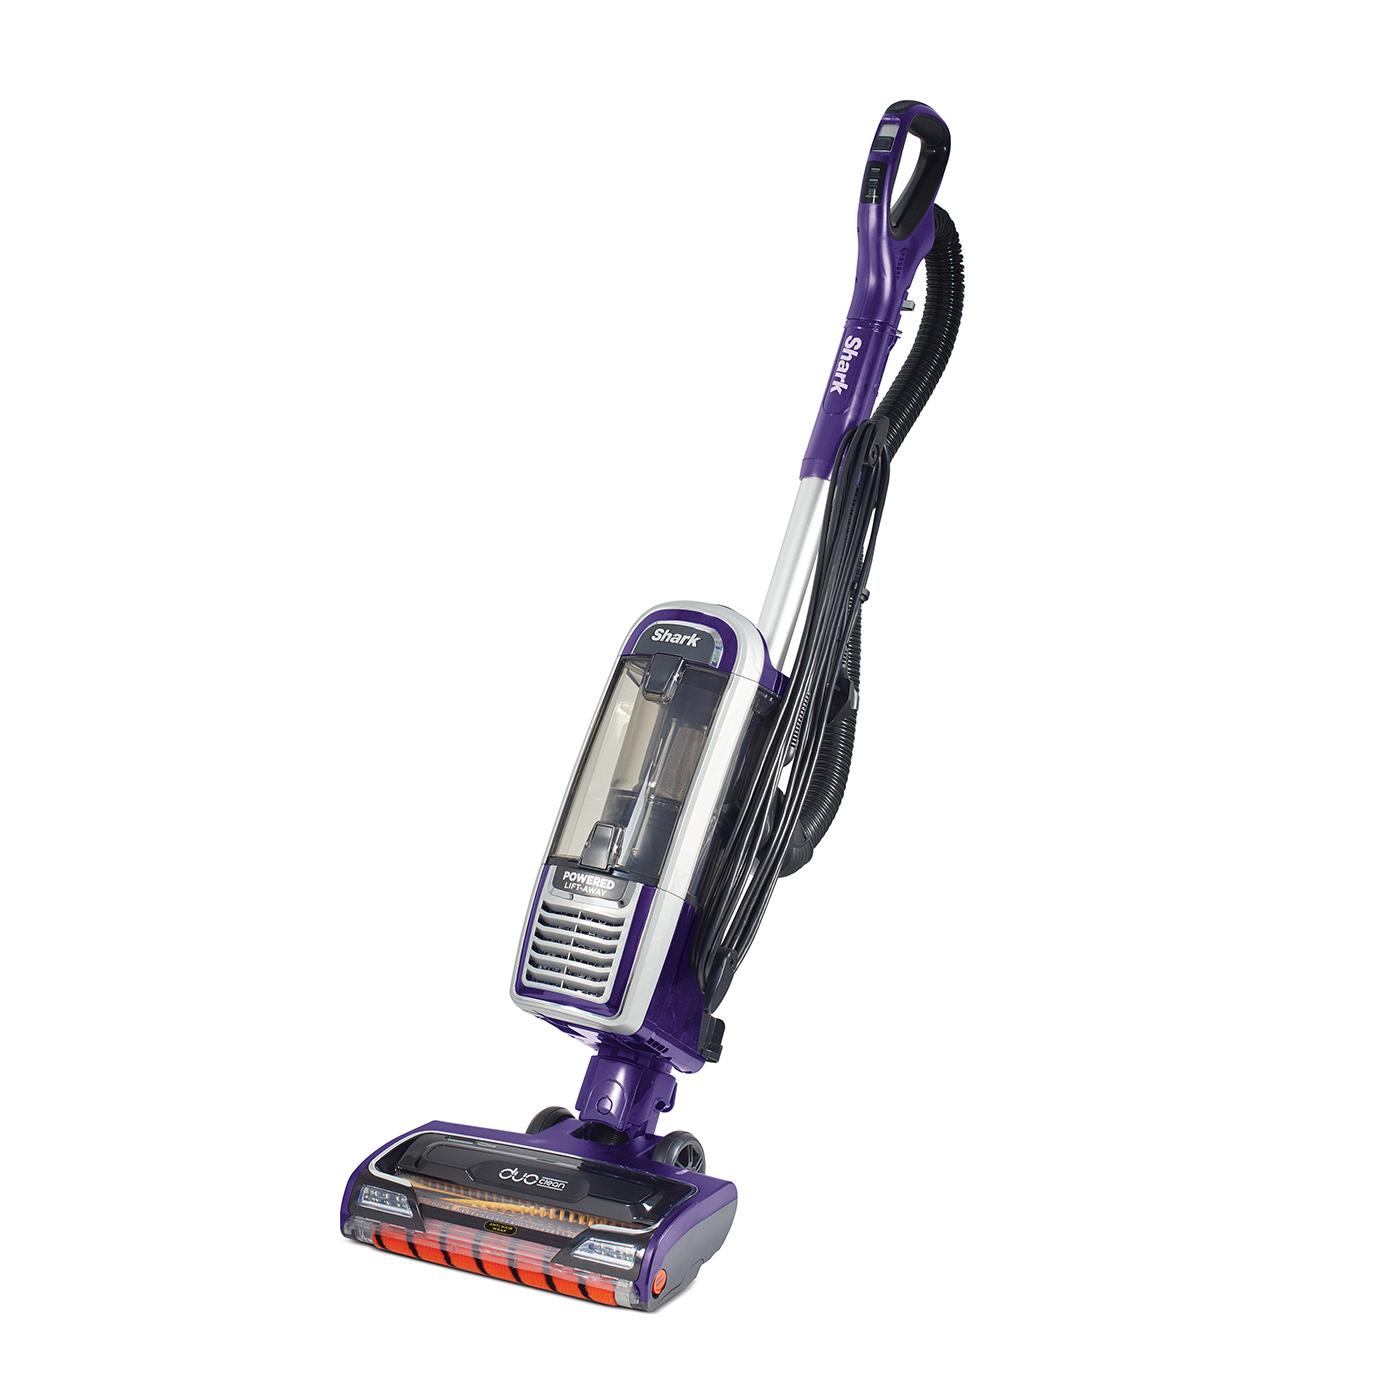 Shark Anti Hair Wrap Upright Vacuum Cleaner AZ910UK